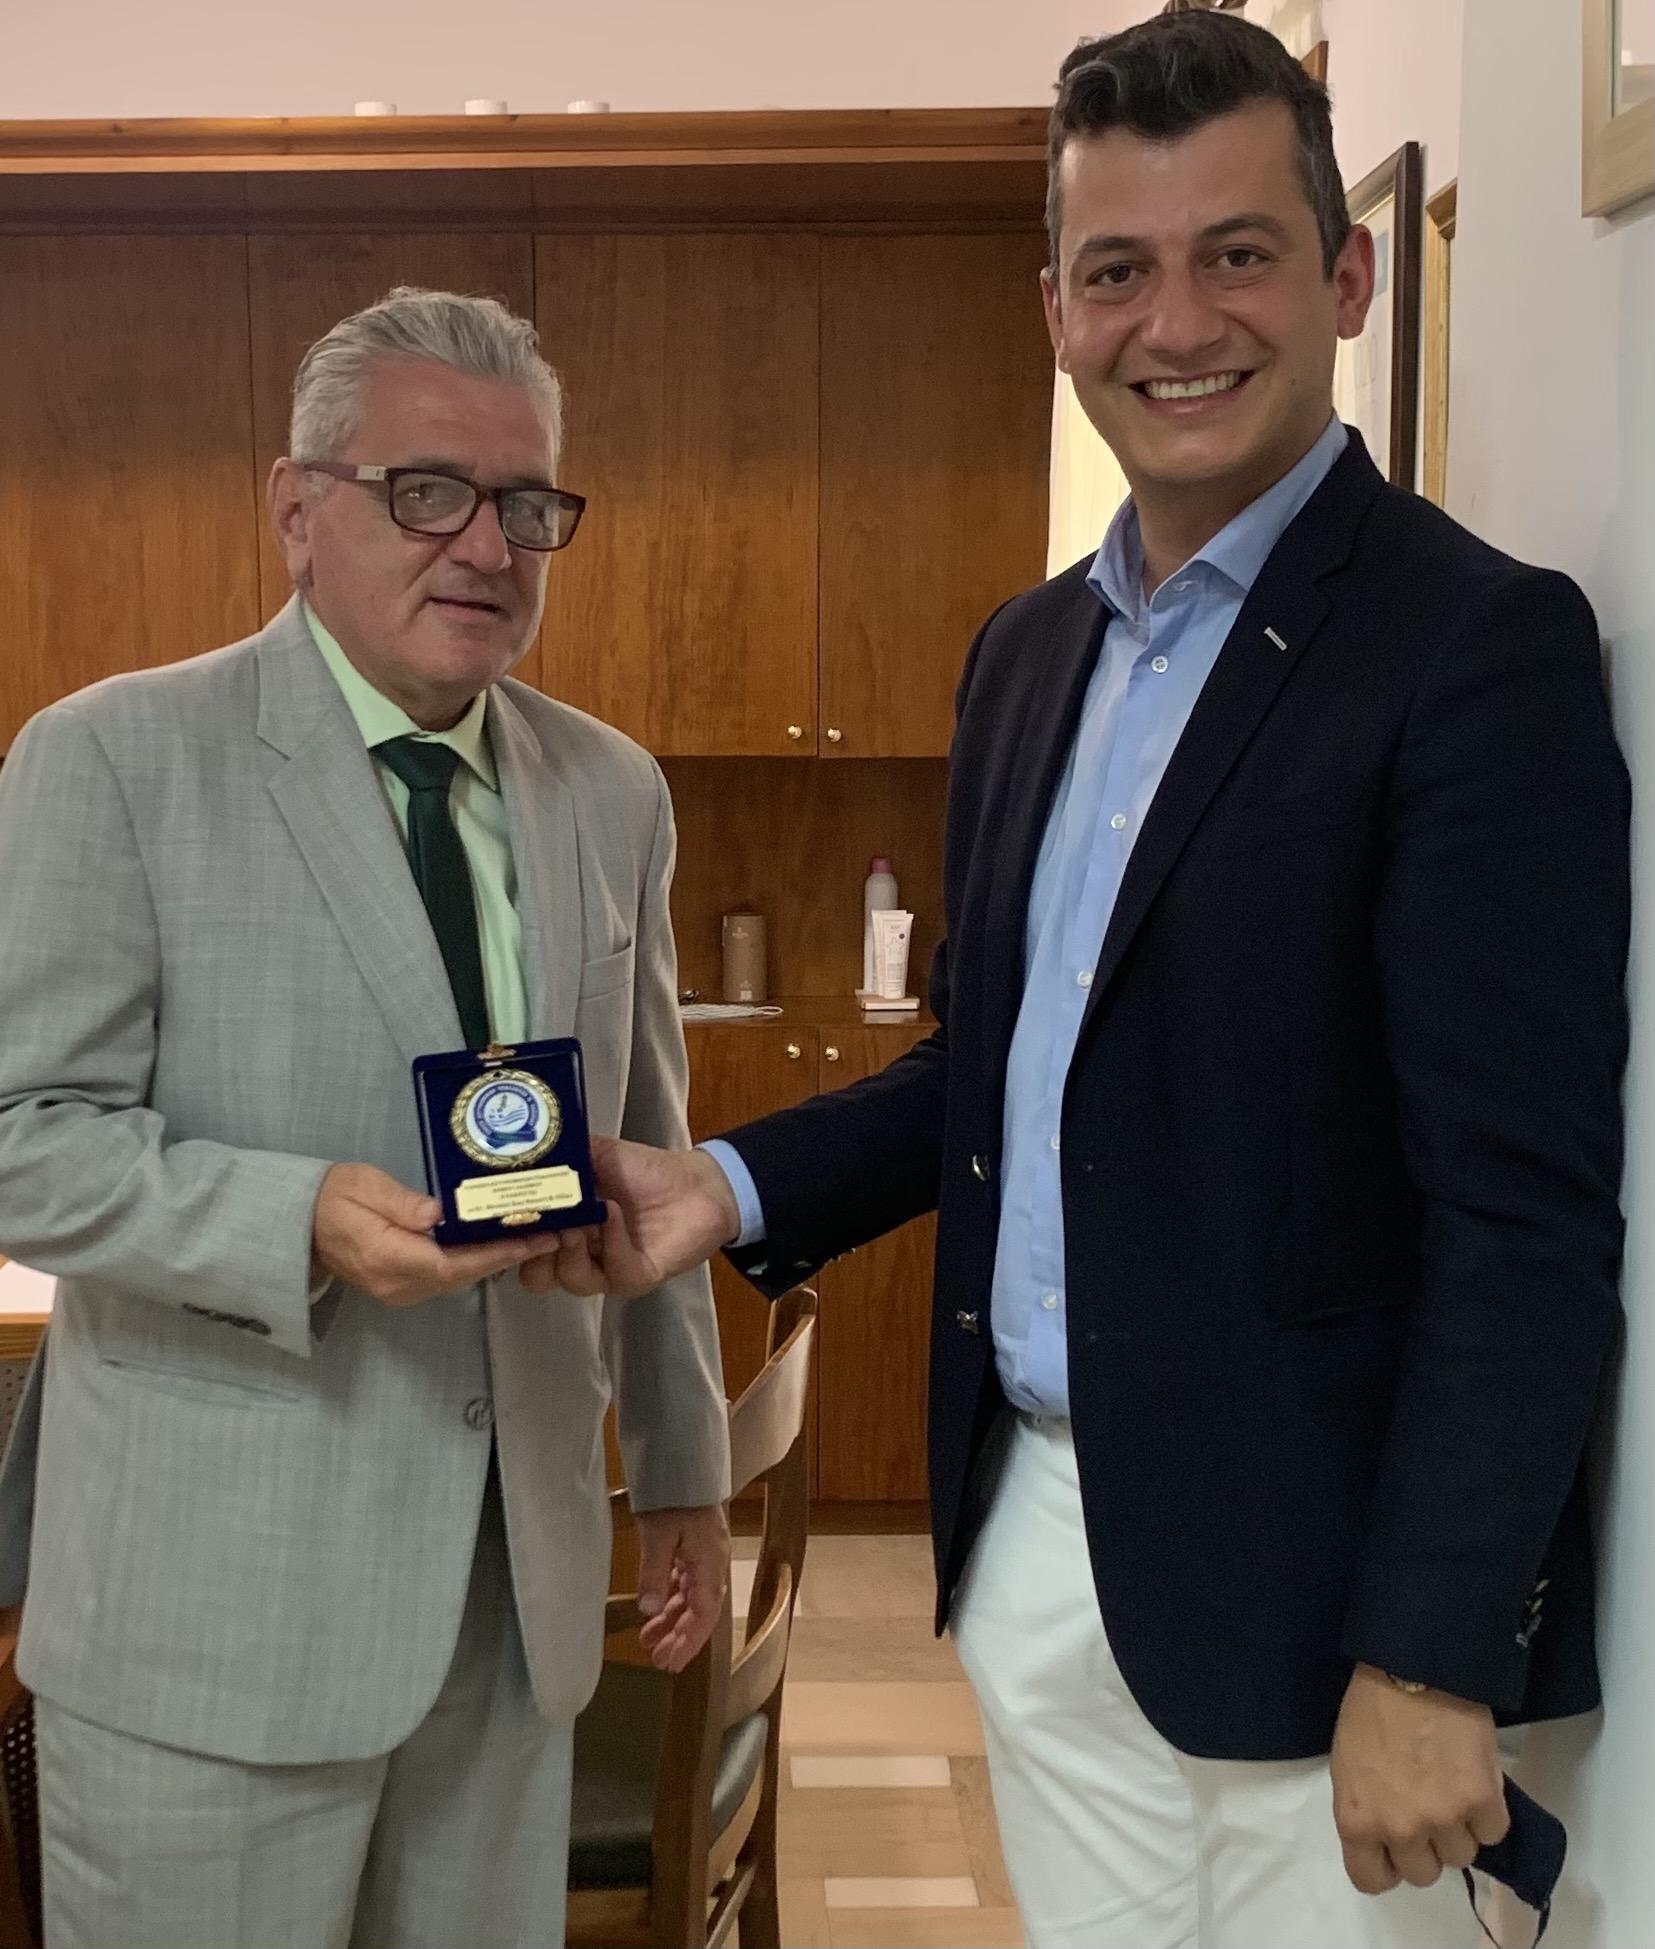 <p>ΔΕΛΤΙΟ ΤΥΠΟΥ ΑΡ. ΠΡΩΤ.:33 Άγιος Νικόλαος, 07 Ιουλίου 202  Συνάντηση είχε ο Πρόεδρος της Ένωσής μας, ΚΑΡΤΣΑΚΗΣ Γεώργιος με τον κ. ΓΛΥΝΟ Αλέξανδρο, Γενικό Διευθυντή του Ξενοδοχείου ST. NICOLAS BAY RESORT HOTEL & VILLAS, όπου ευχαριστήσαμε αυτόν καθώς και τον κ. ΑΛΕΞΑΝΔΡΑΚΗ, ιδιοκτήτη της ΞΕΝΟΔ. & ΤΟΥΡΙΣΤΙΚΗ εταιρείας ΑΛΦΑ […]</p>